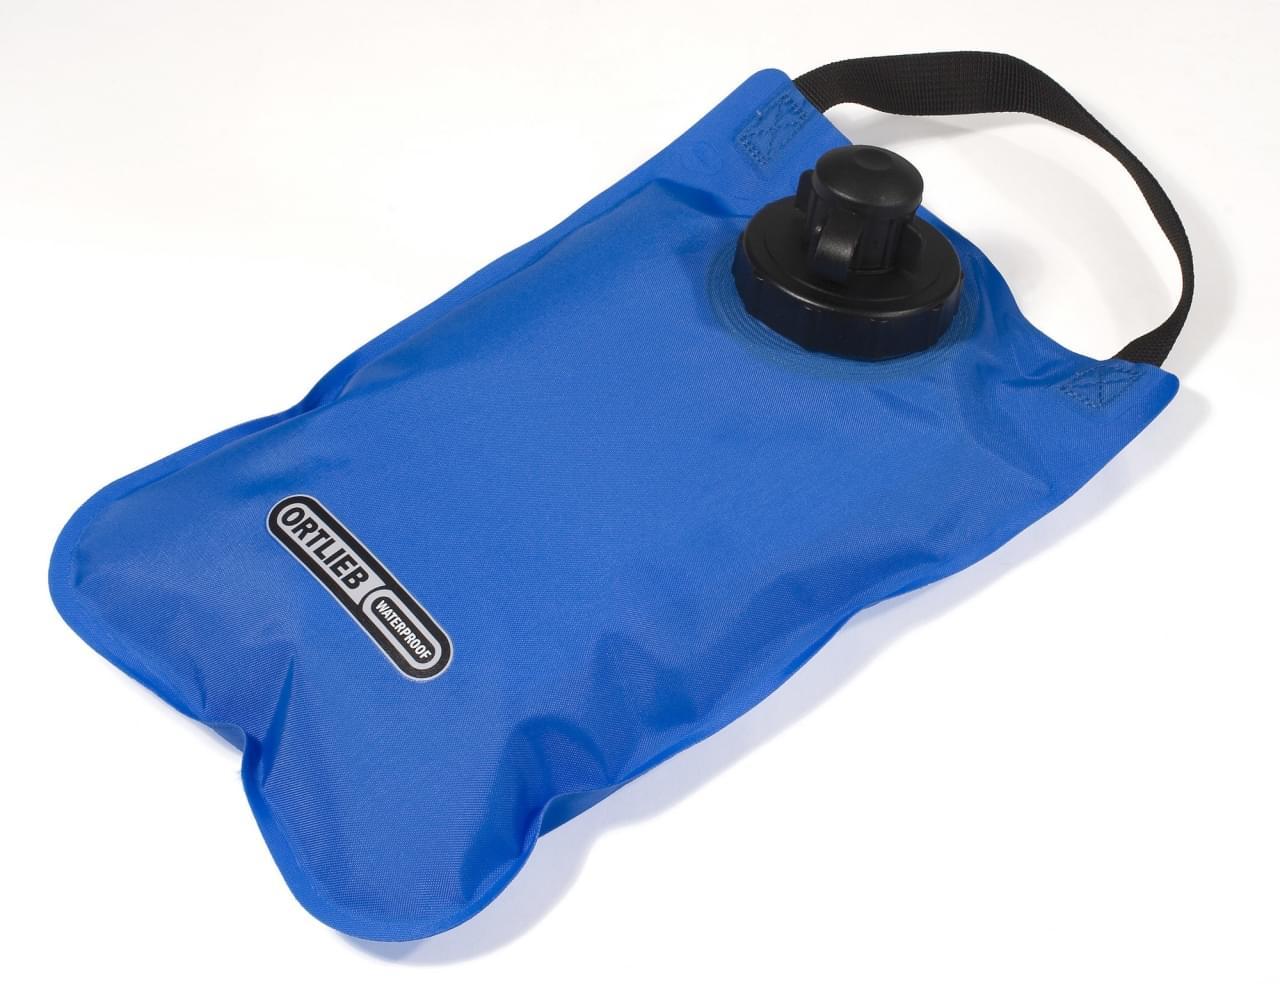 Ortlieb Water zak 2 liter